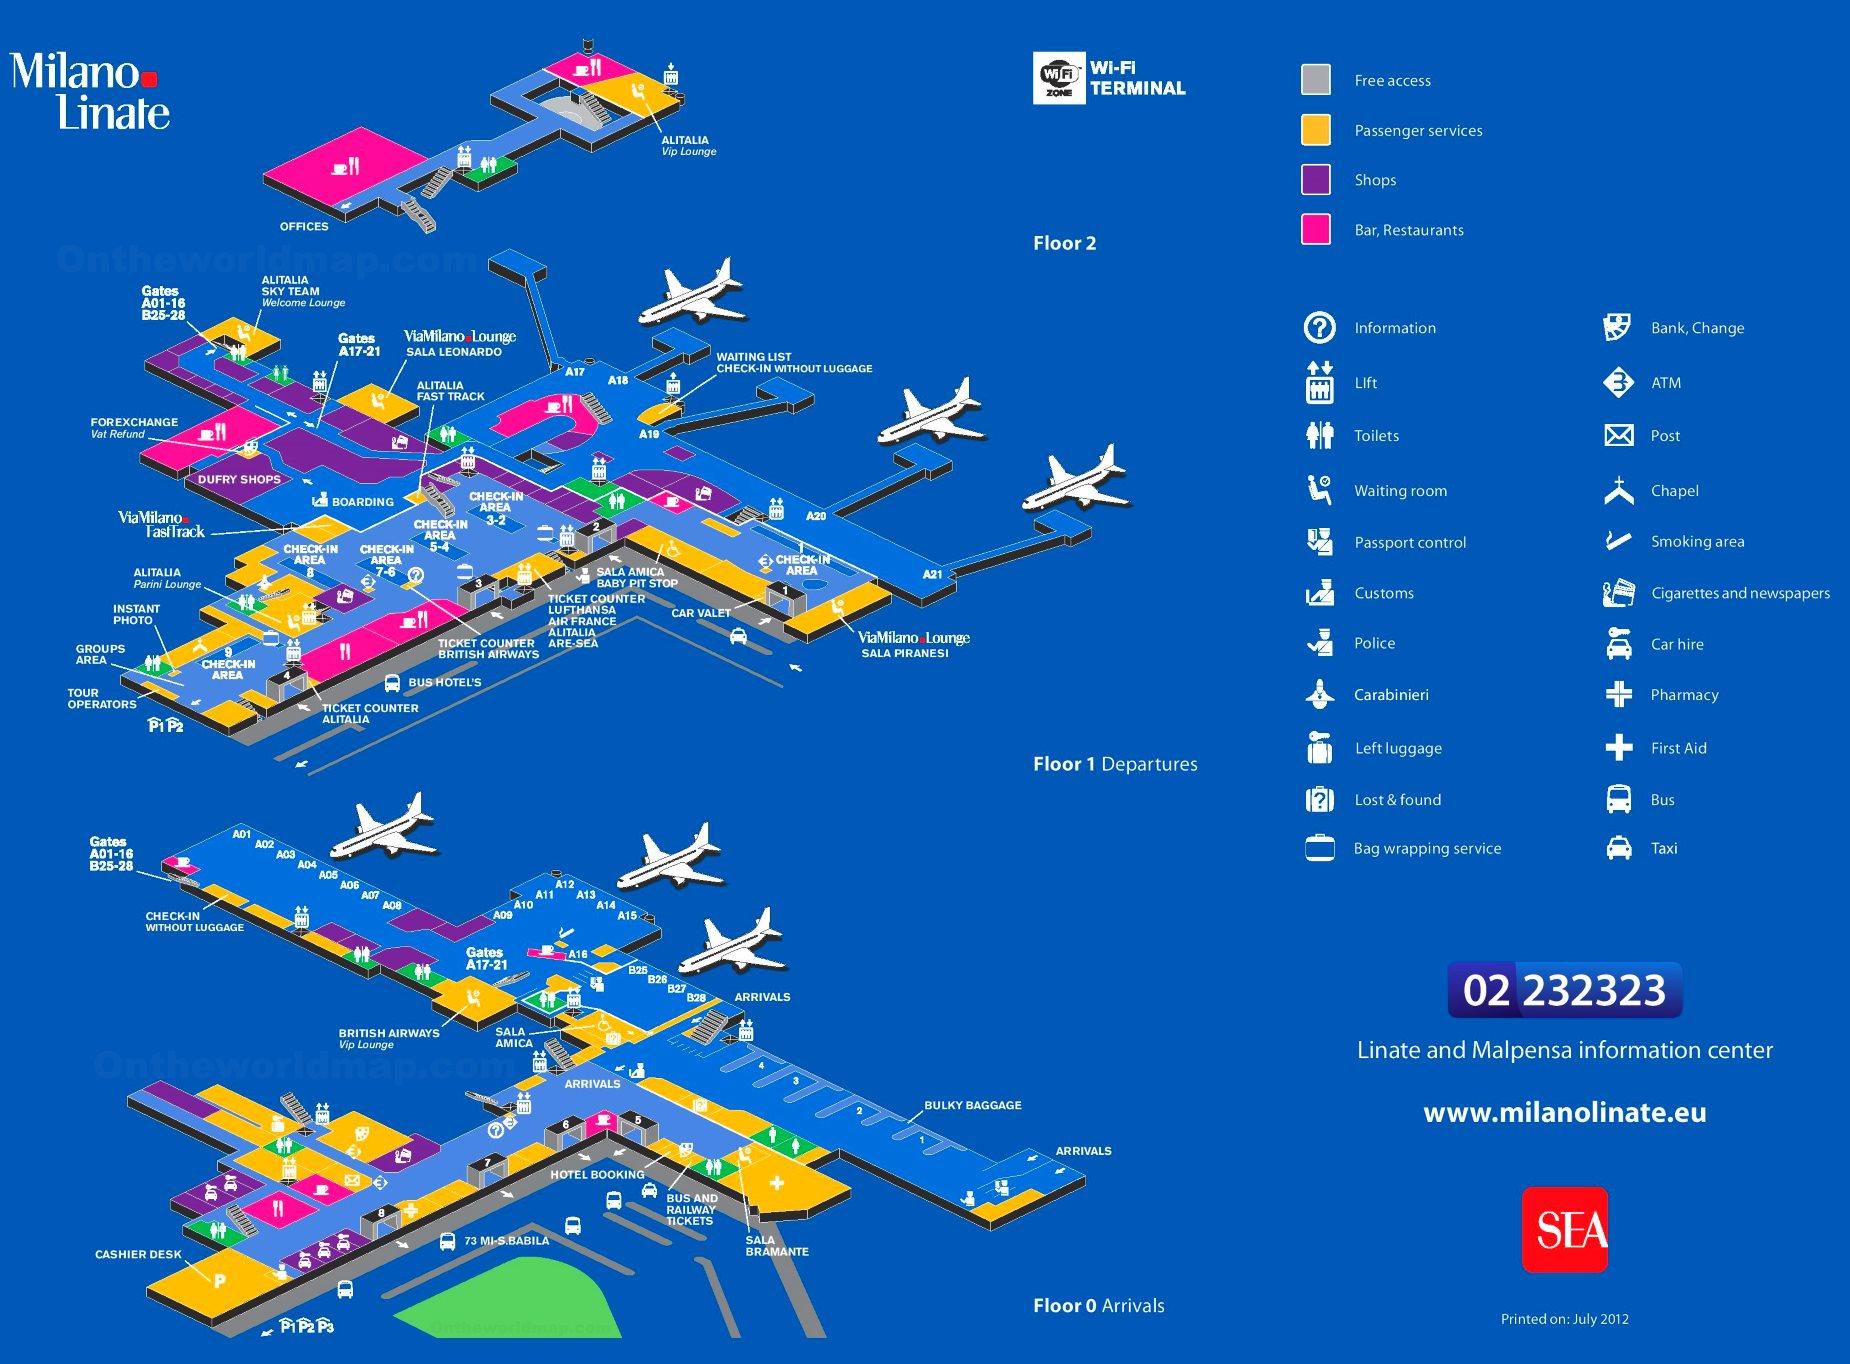 Milan Linate Airport Map